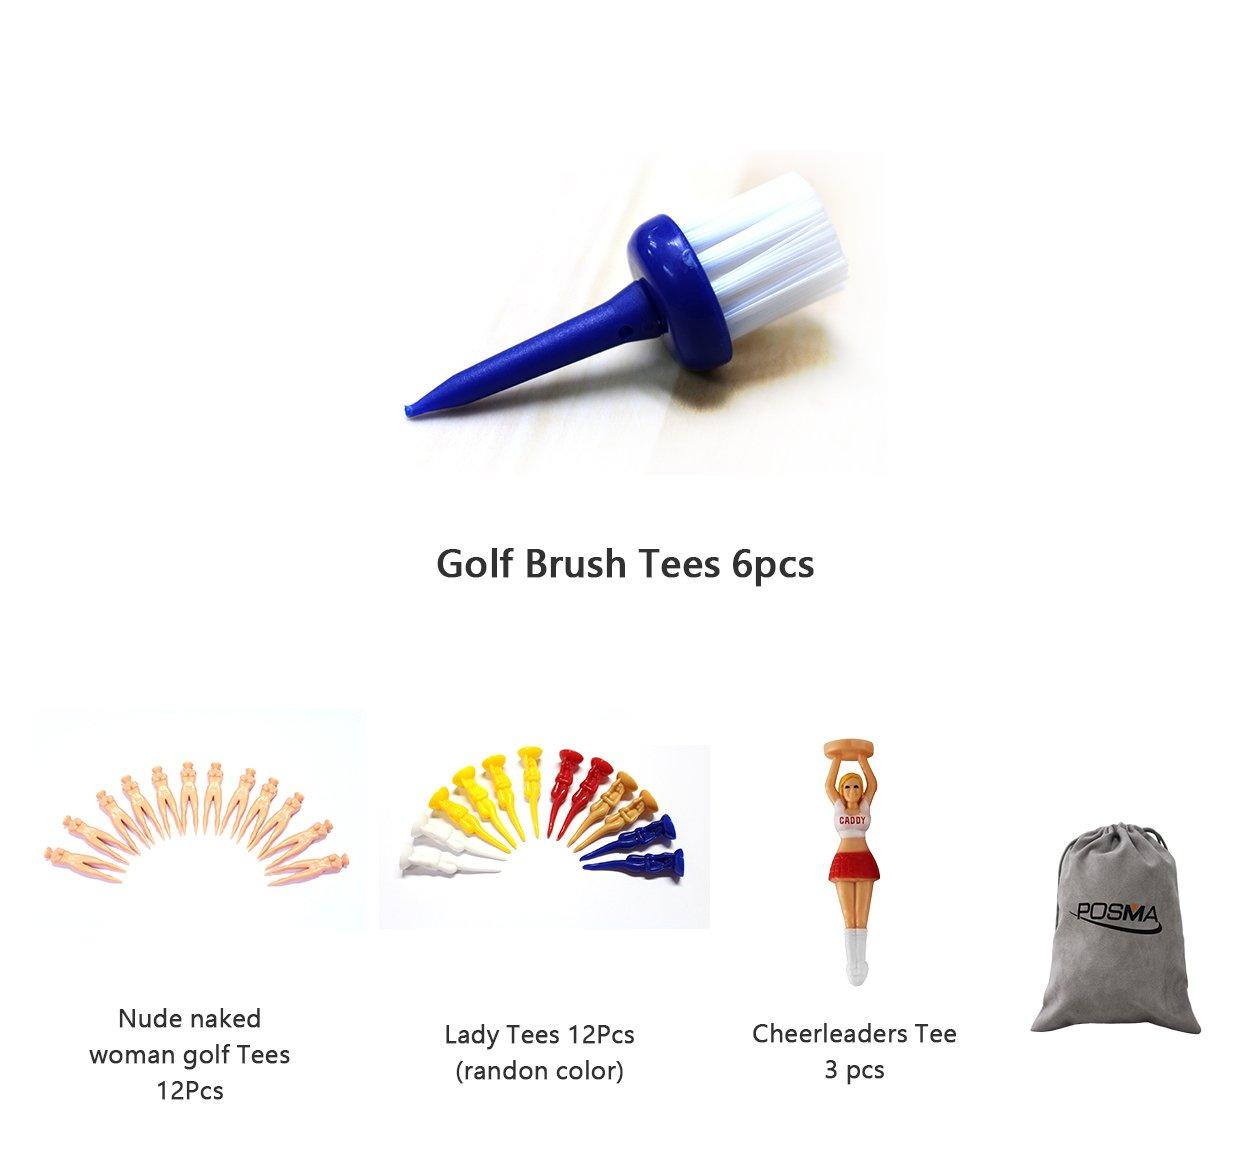 POSMA GTS030 Multi Senies Tee bundle set with 6pcs Golf Brush Tees + 12pcs nude naked woman golf tees + 12pcs golf lady tees + 3pcs golf cheerleader tees + 1pc Flannel Storage Bag